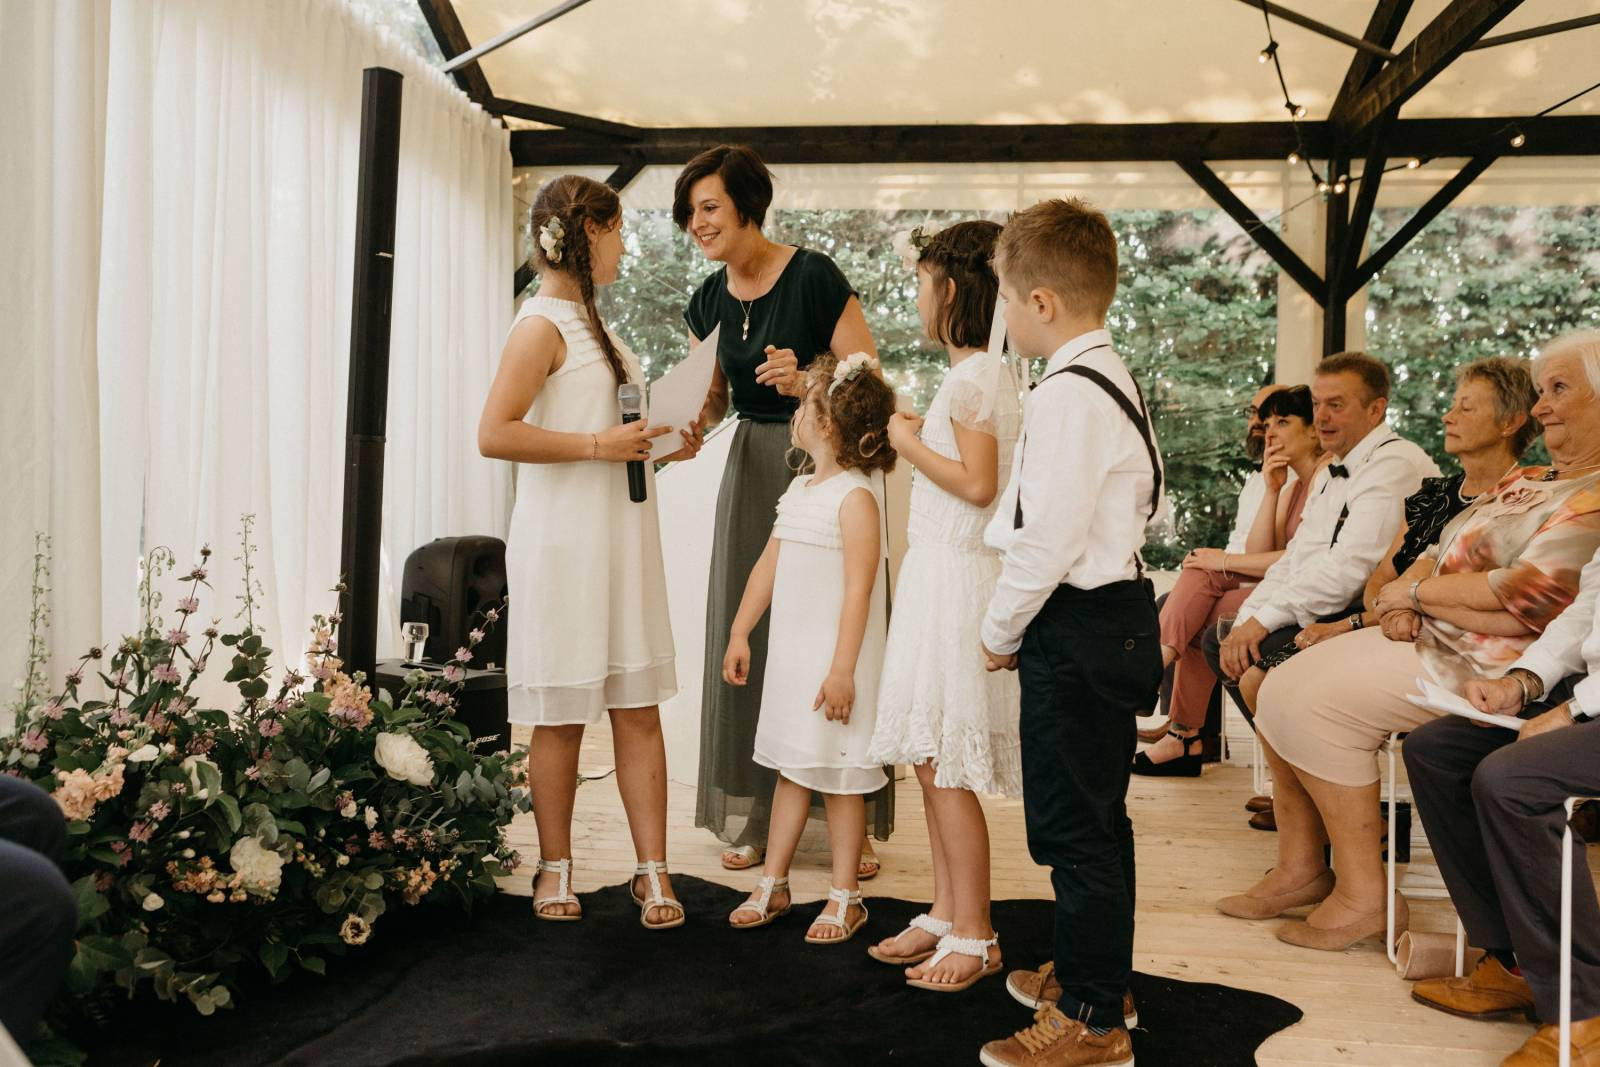 Tine De Donder - Huwelijksceremonie - Ceremoniespreker - Mathias Hannes - House of Weddings 30